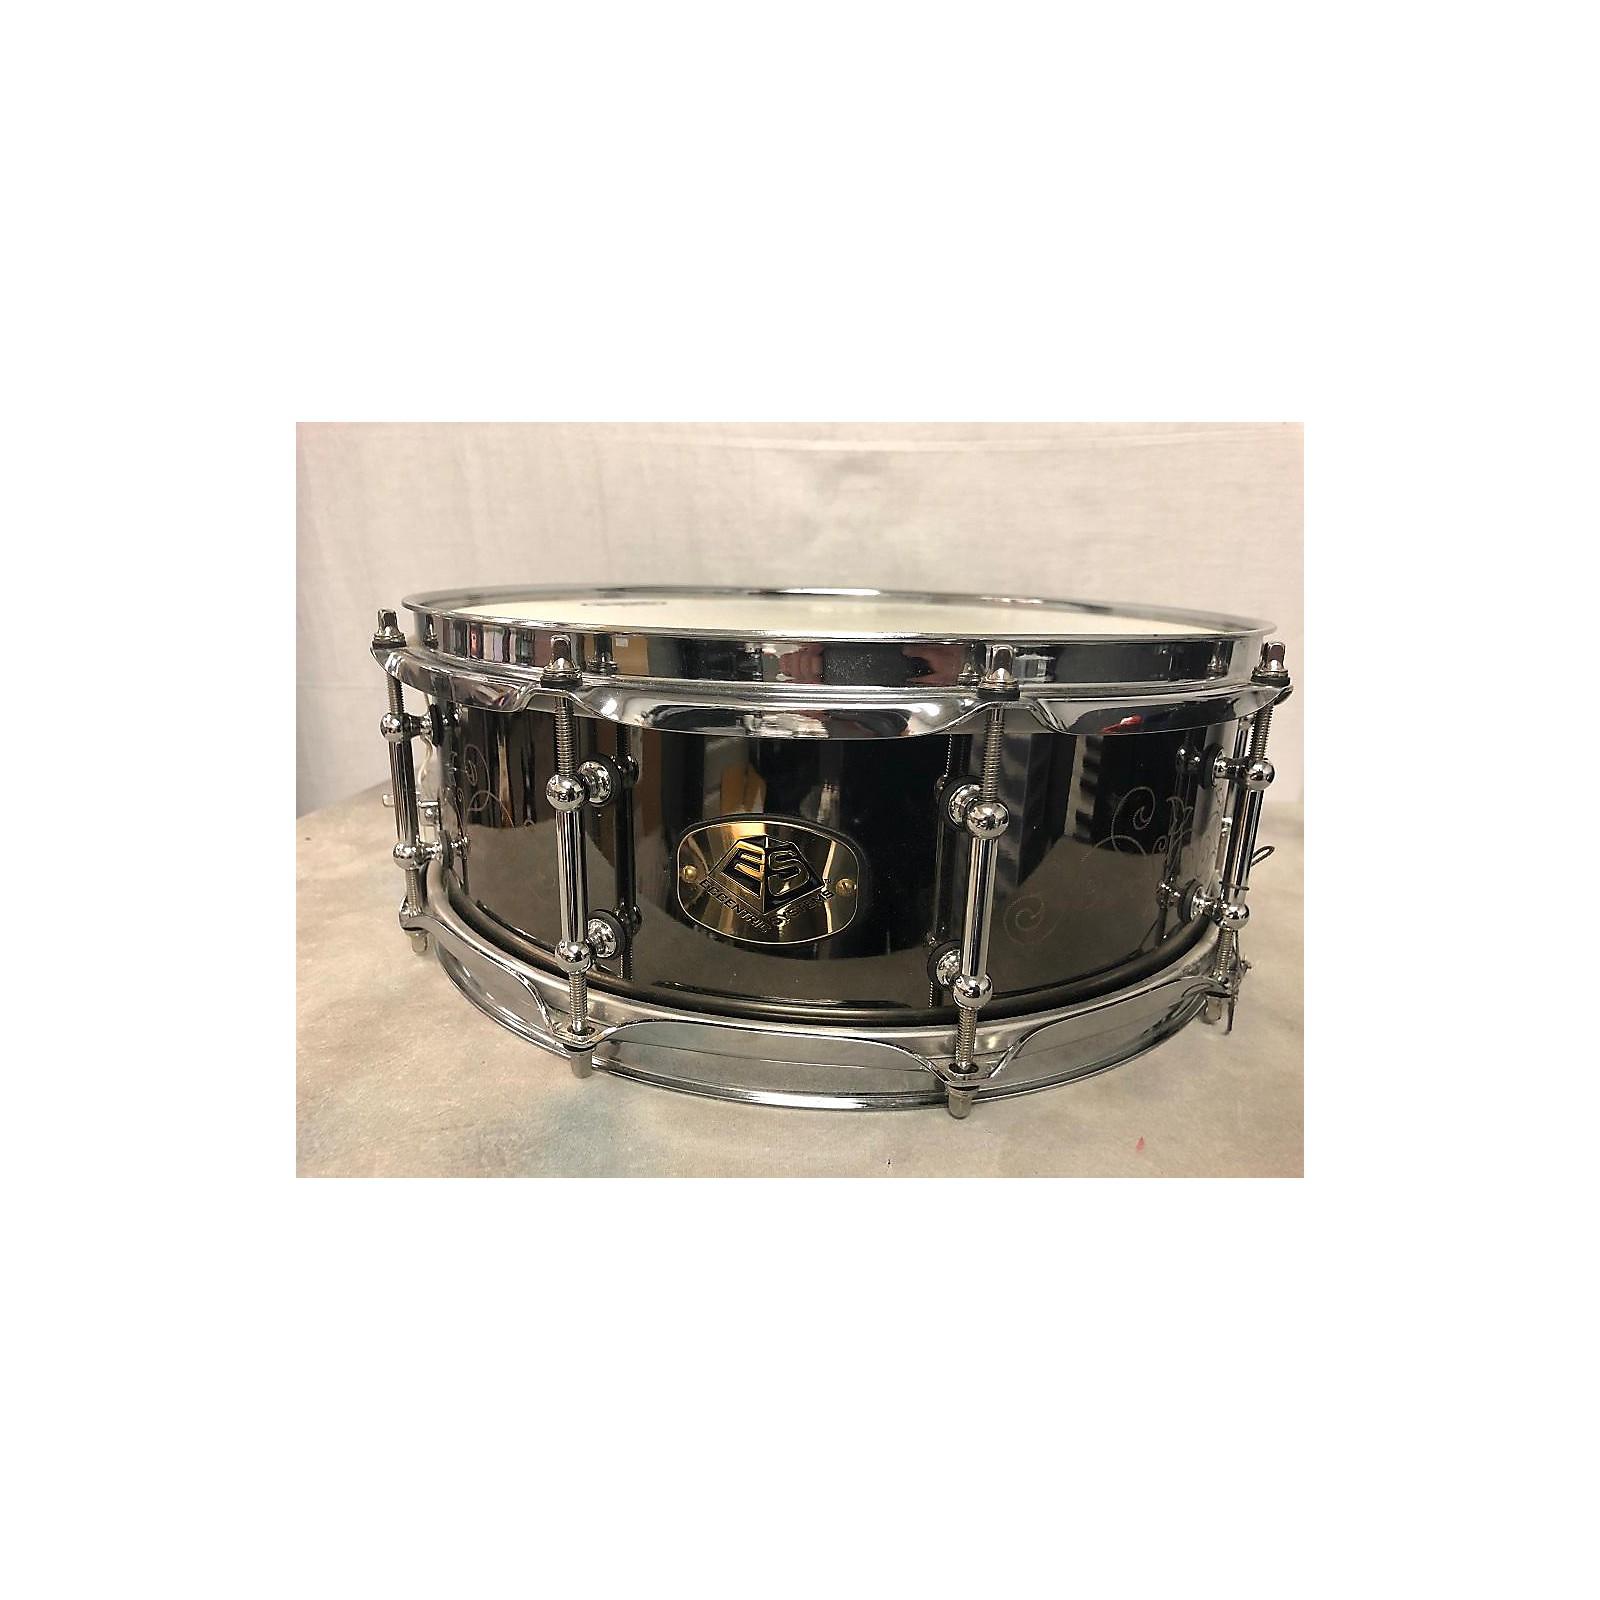 Eccentric Systems Design 5.5X14 BRASS SNARE Drum